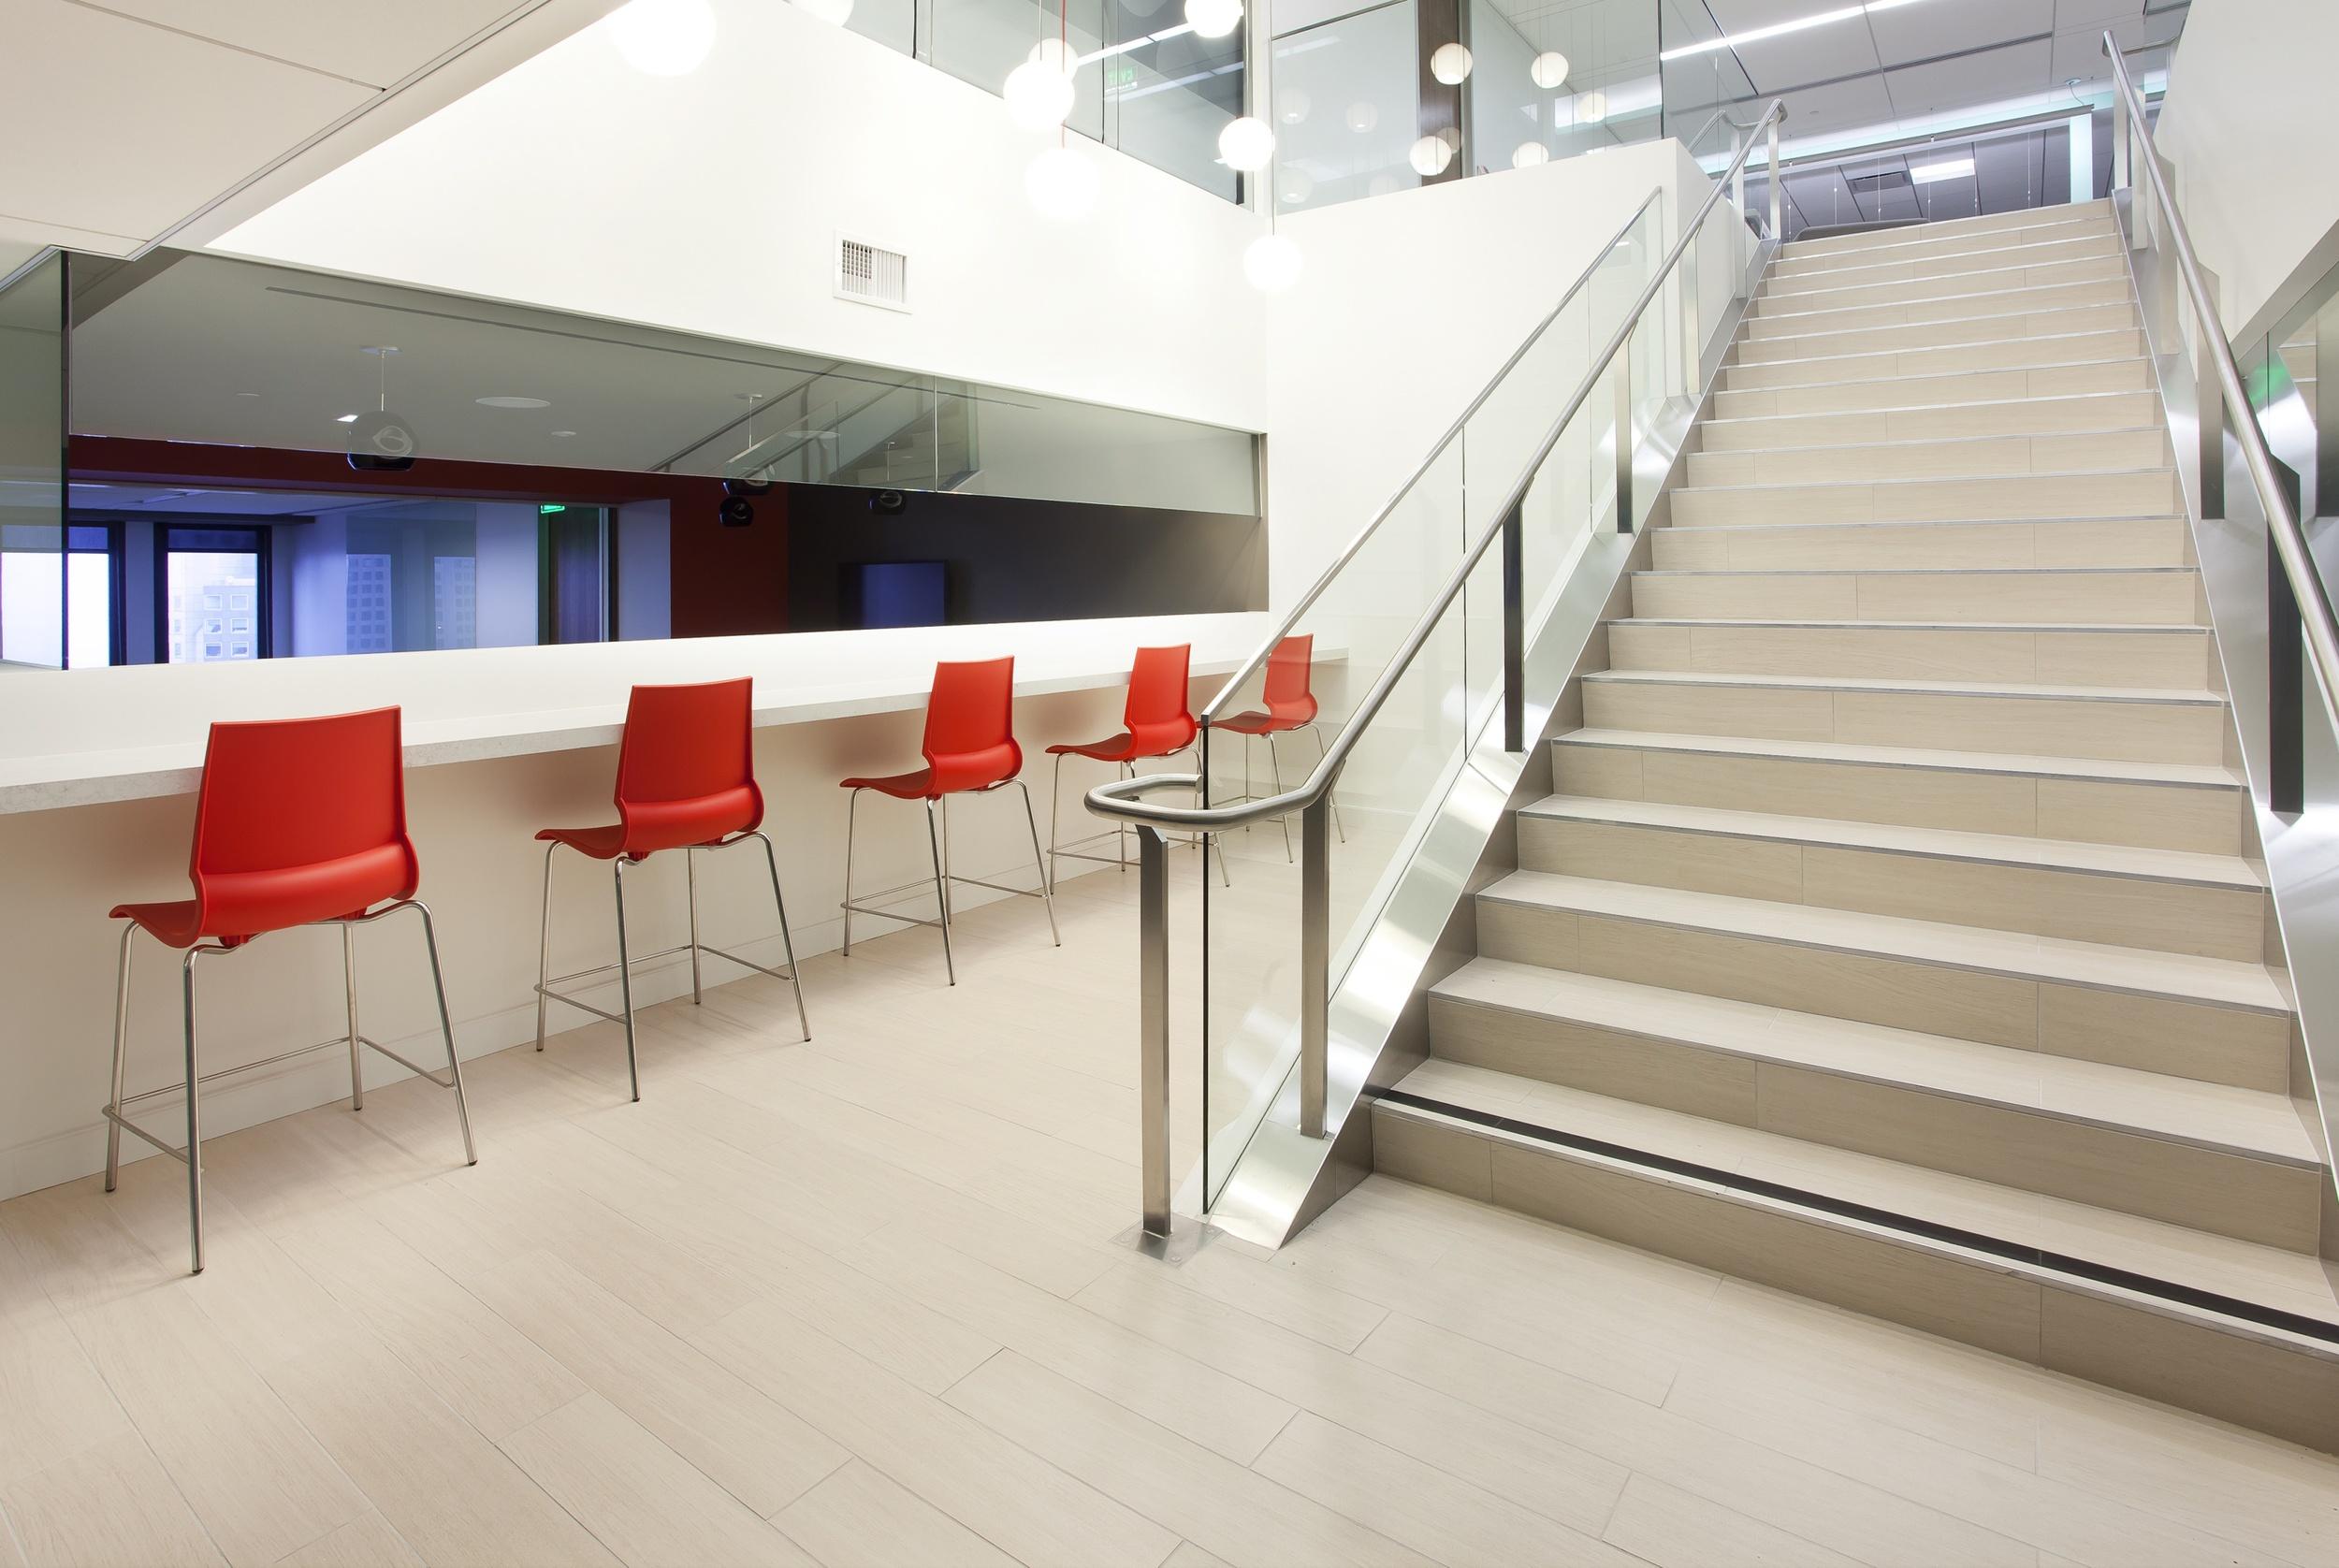 525MarketMedivation Stairs5.jpg